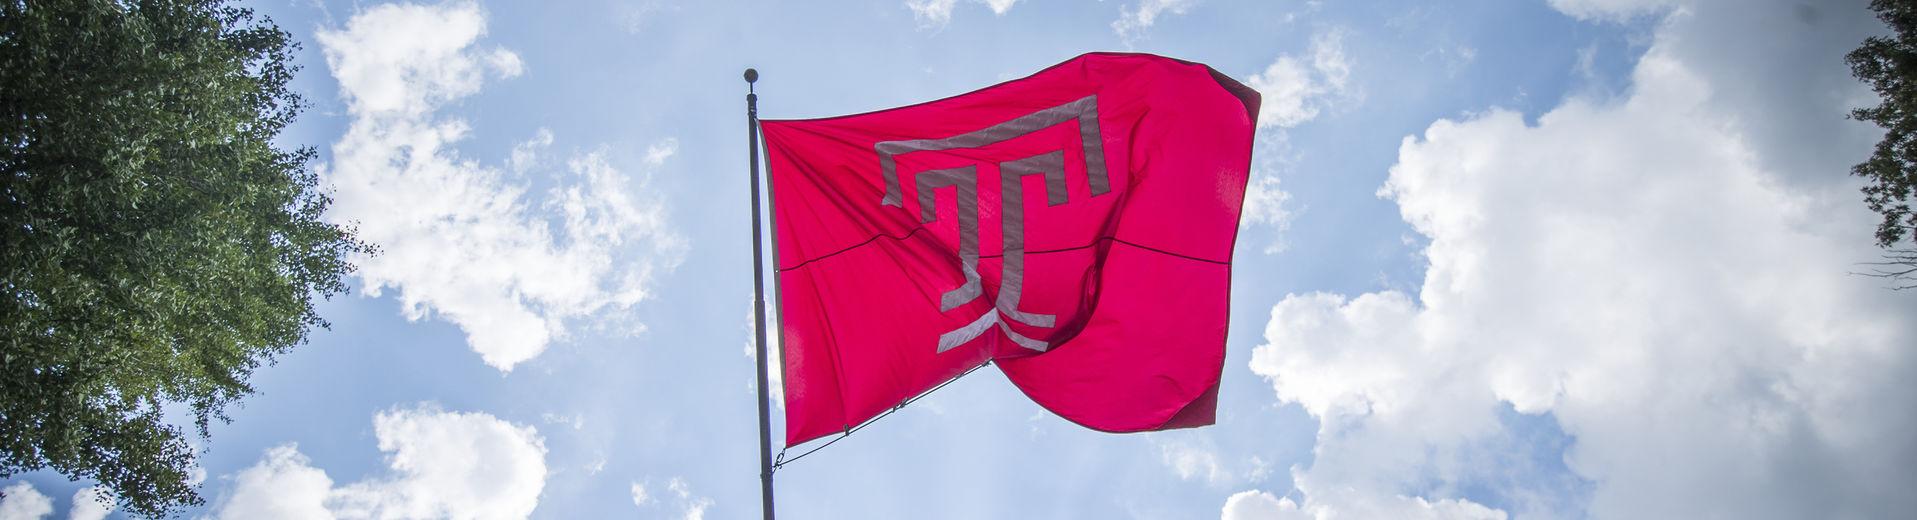 "Temple ""T"" flag flying from Sullivan."